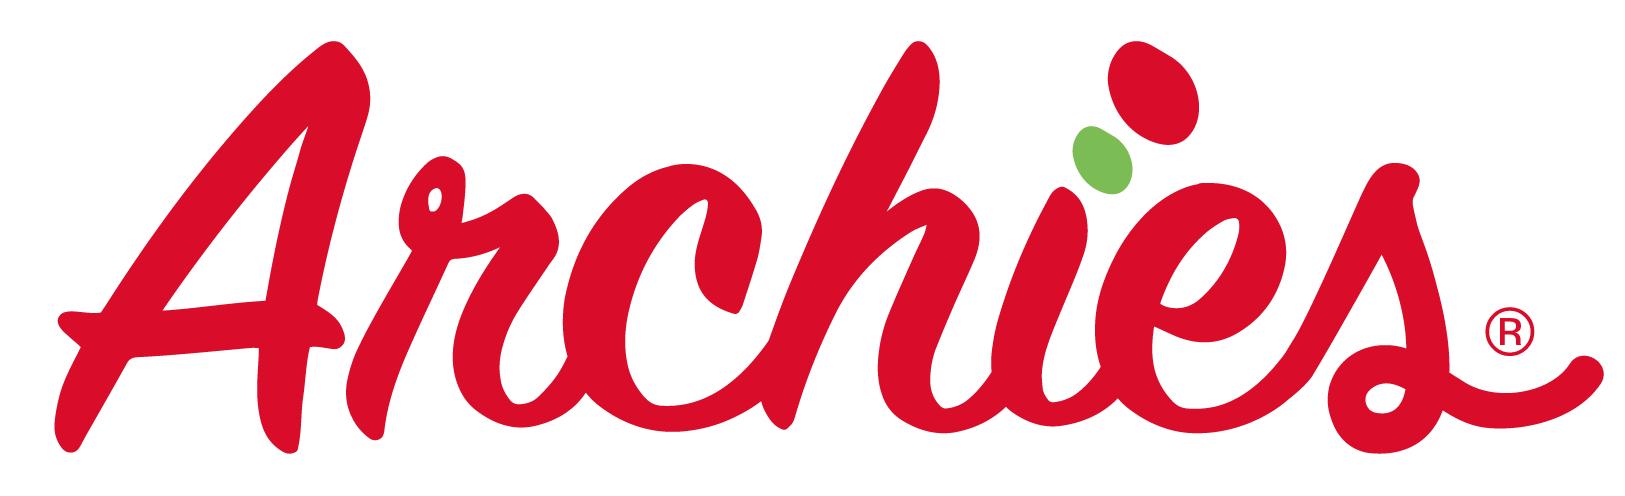 Archies Ibis